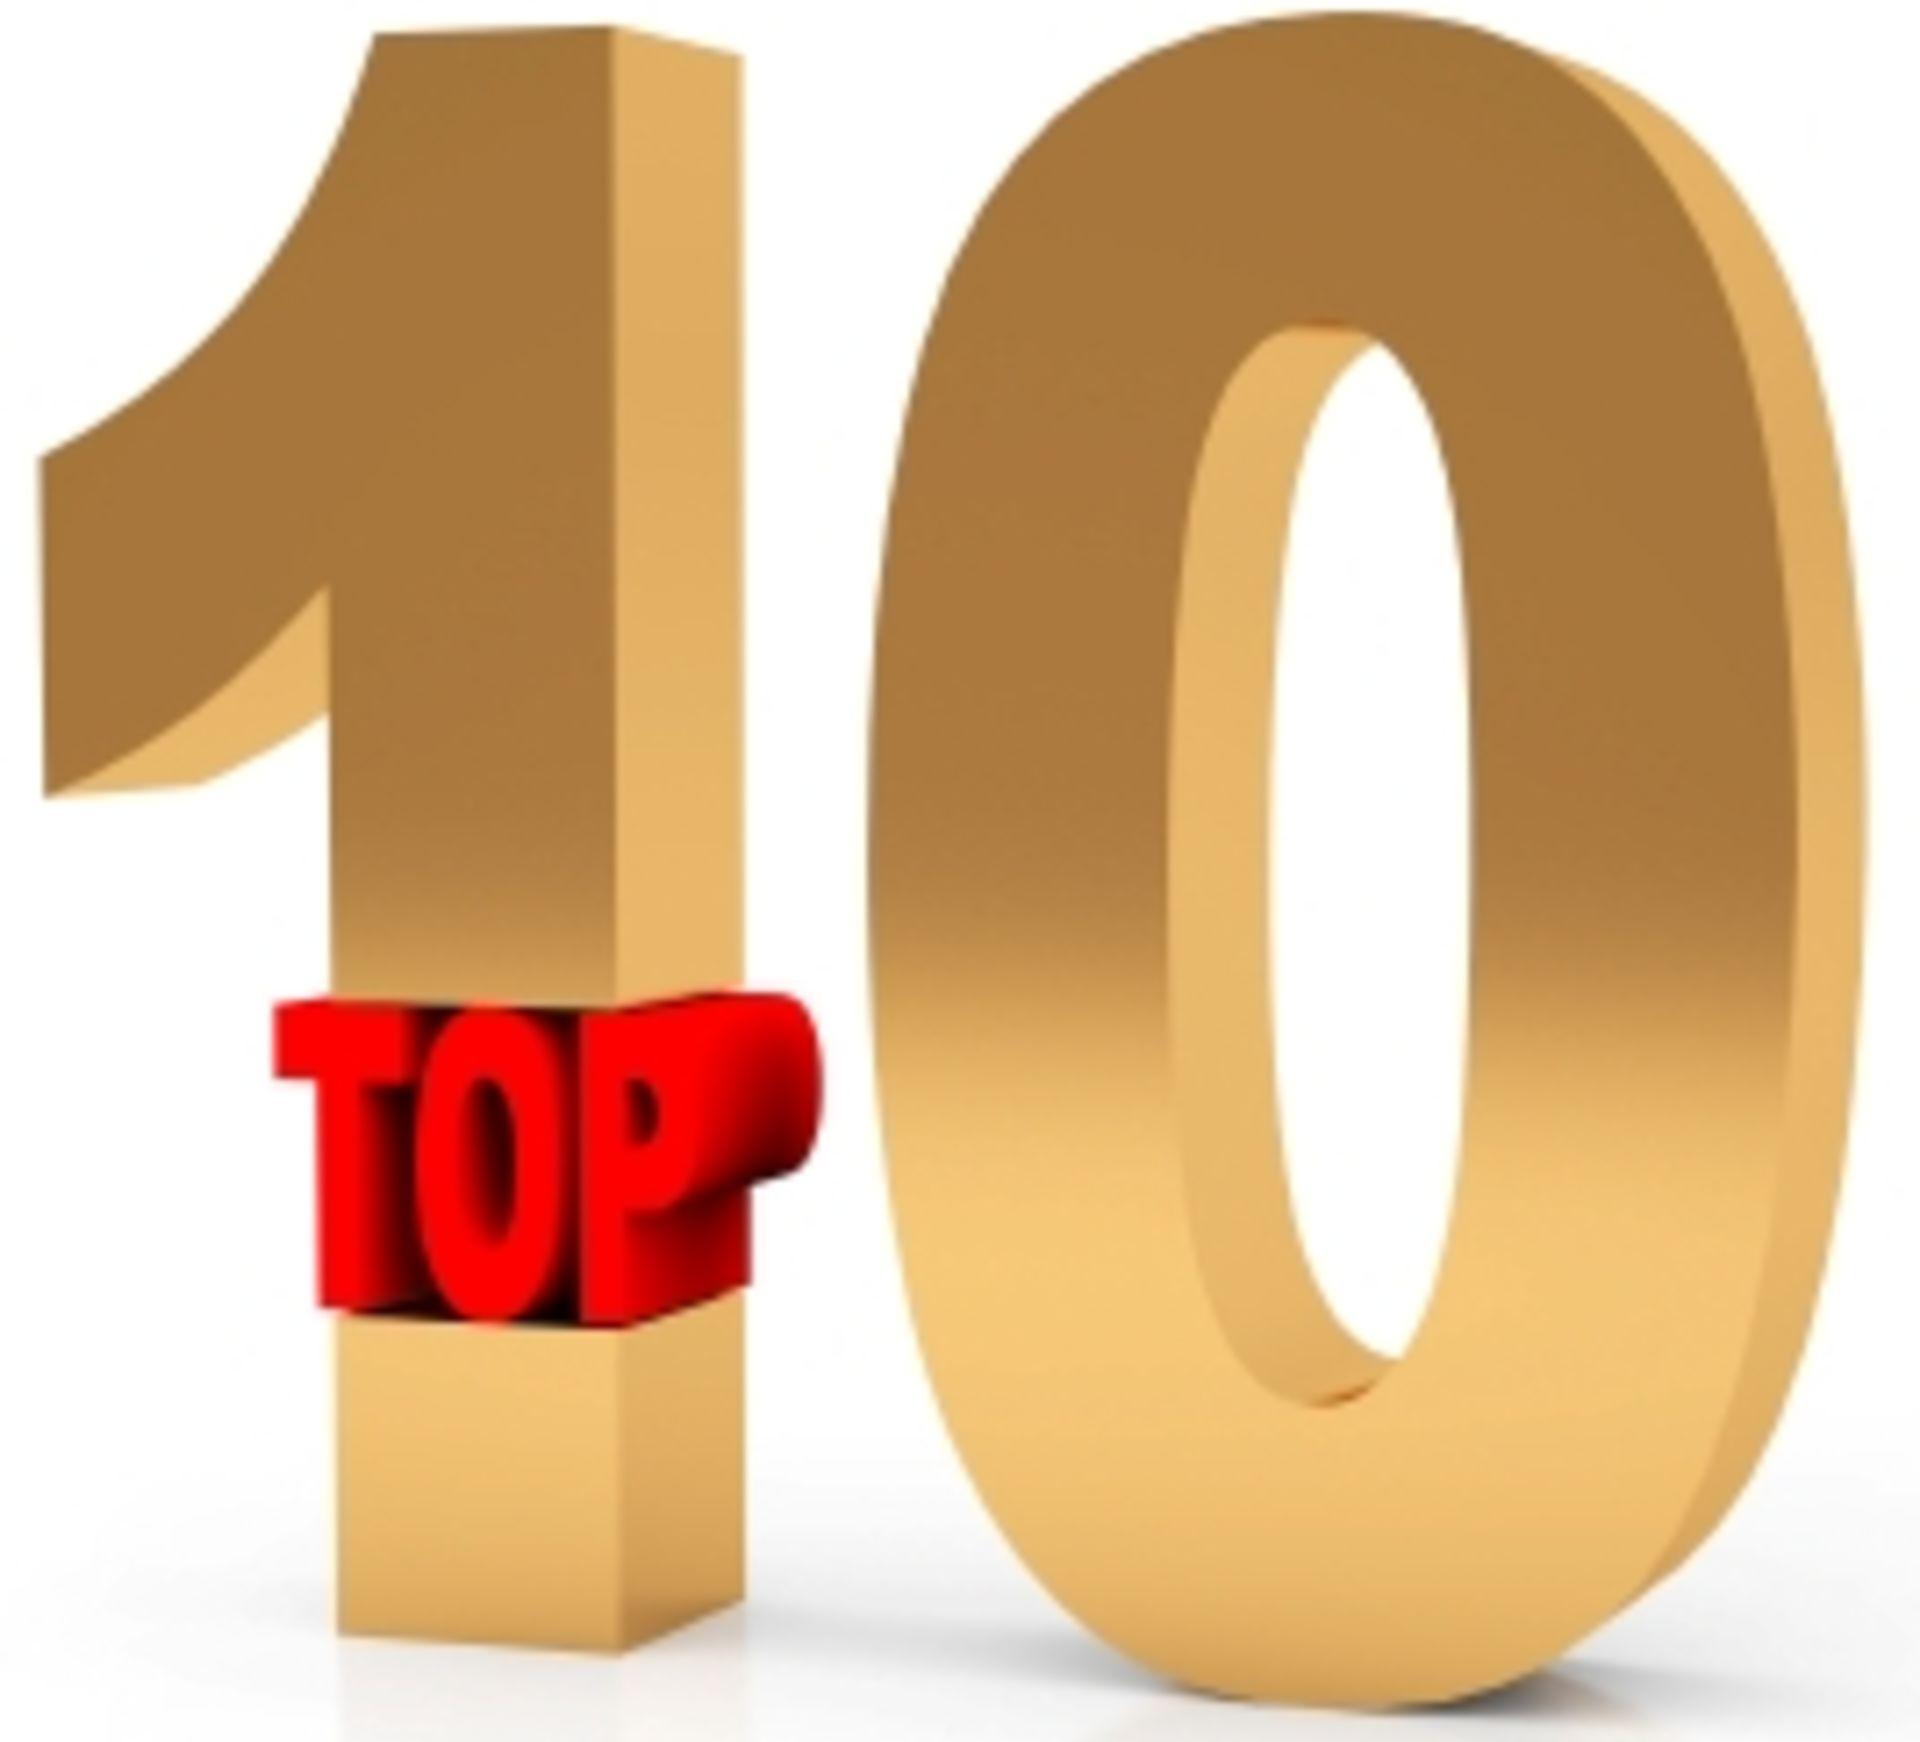 Top Ten Identification Rules for 1031 Exchanges